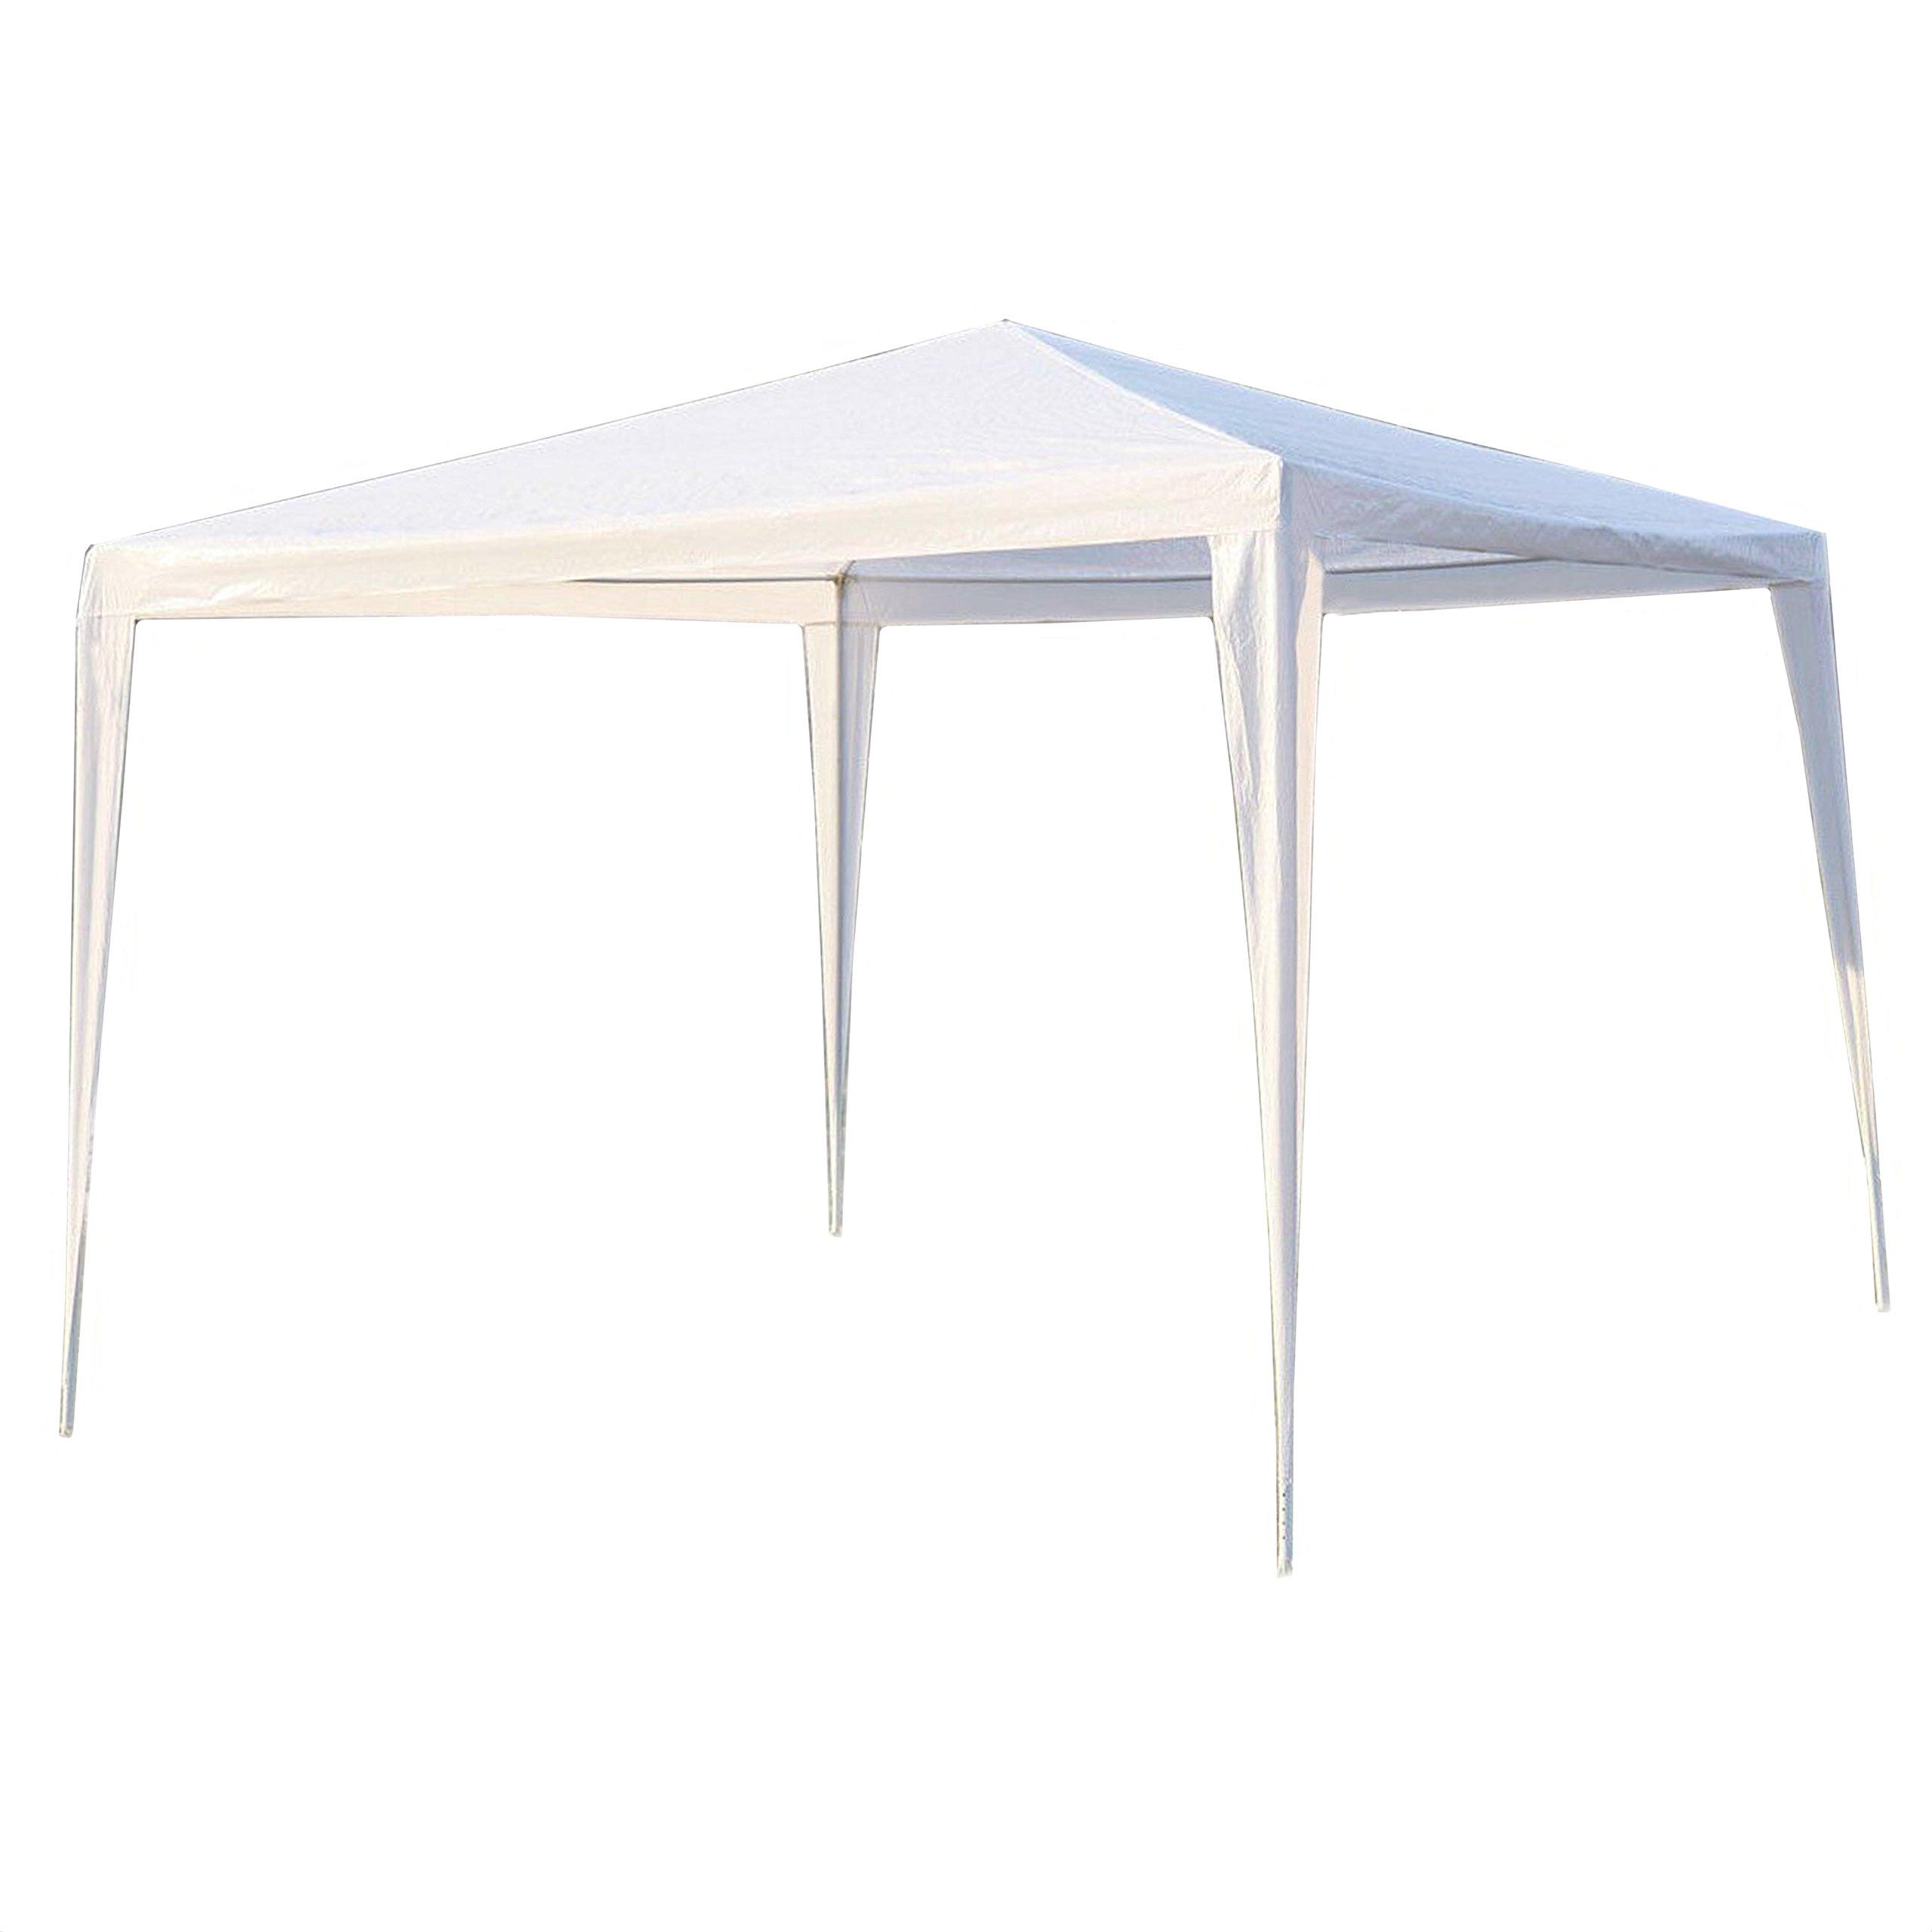 ALEKO GZ10X10WH Popup Polyester Gazebo Canopy Patio Coffee Shelter 10 x 10 Feet White